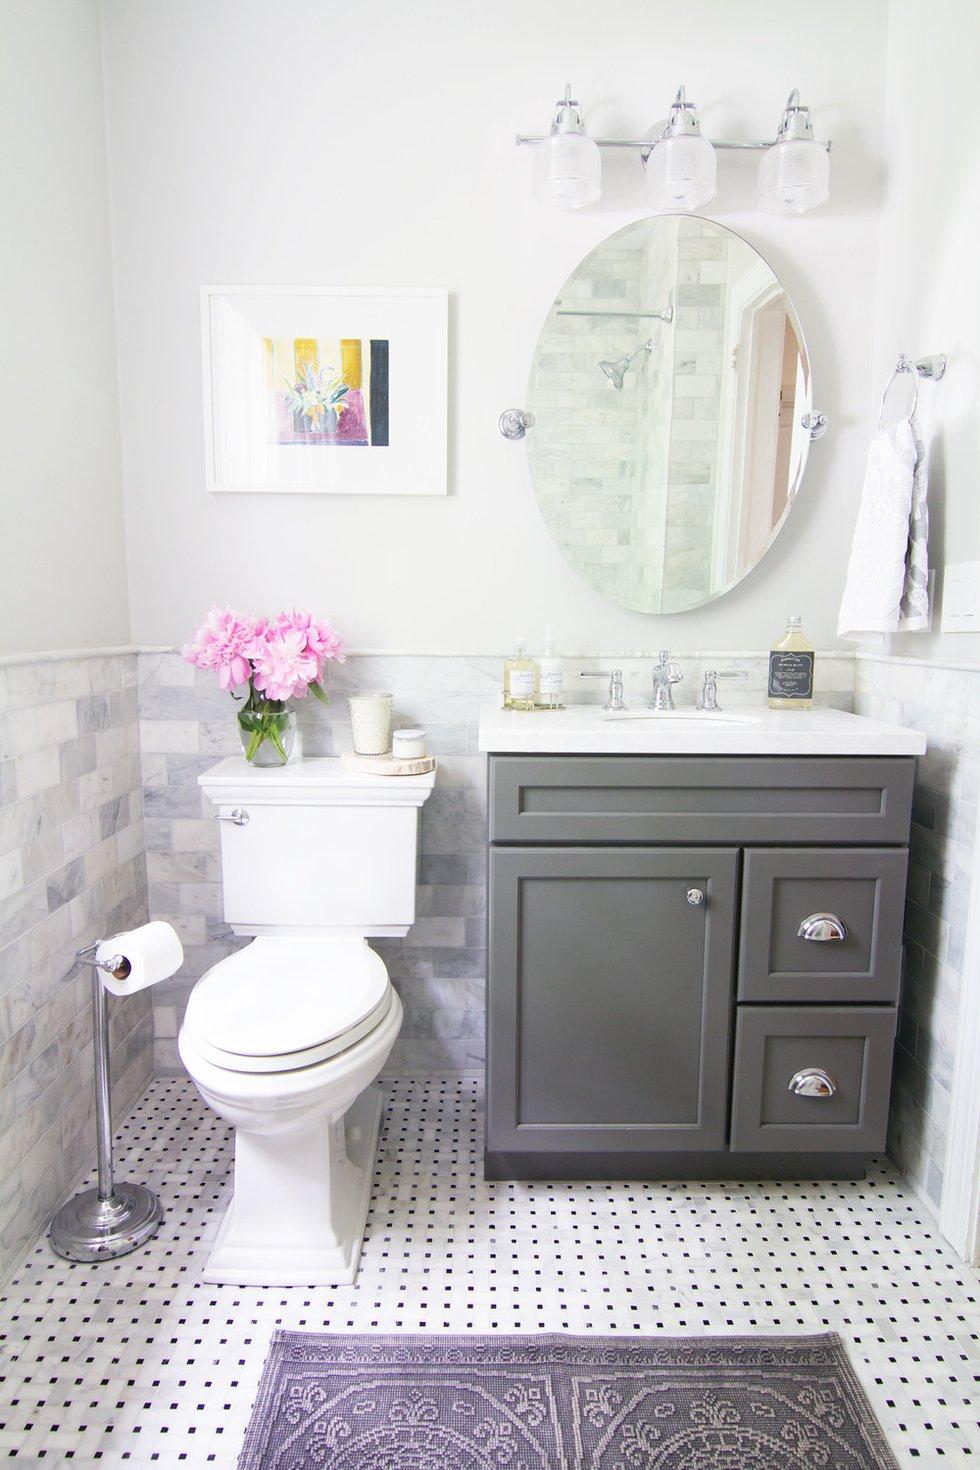 Amazing 30 of The Best Small and Functional Bathroom Design Ideas small bathroom decor ideas